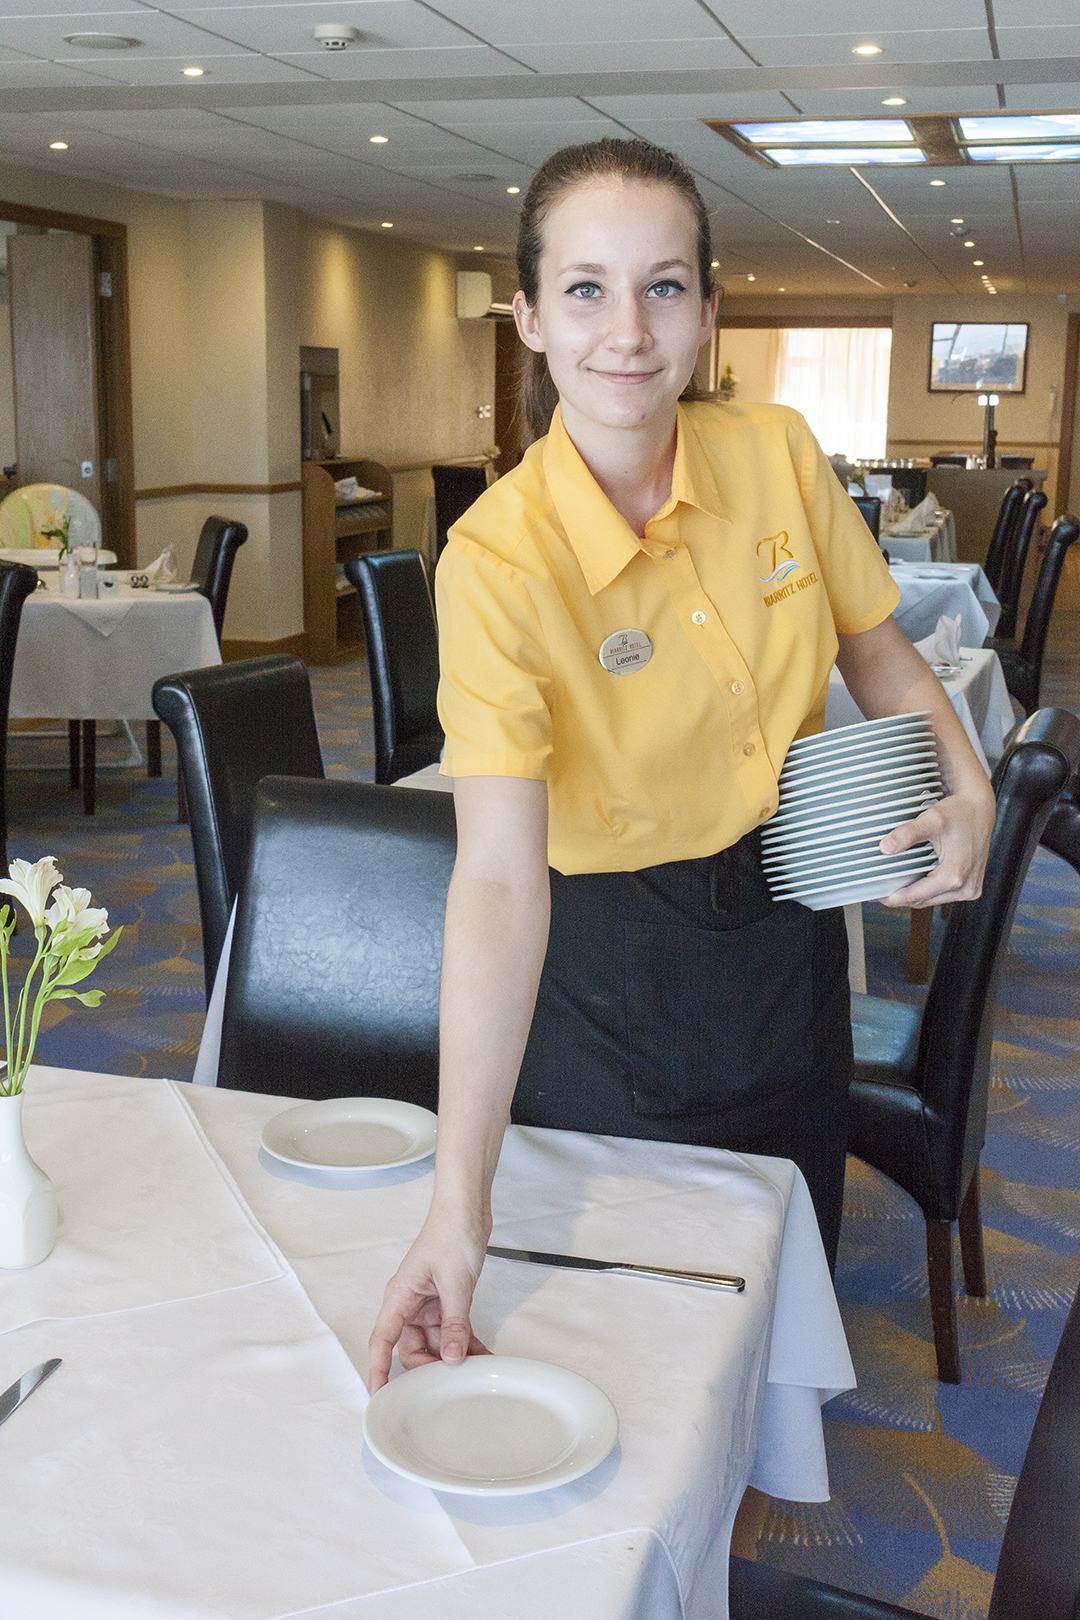 biarritz staff serving_2.jpg